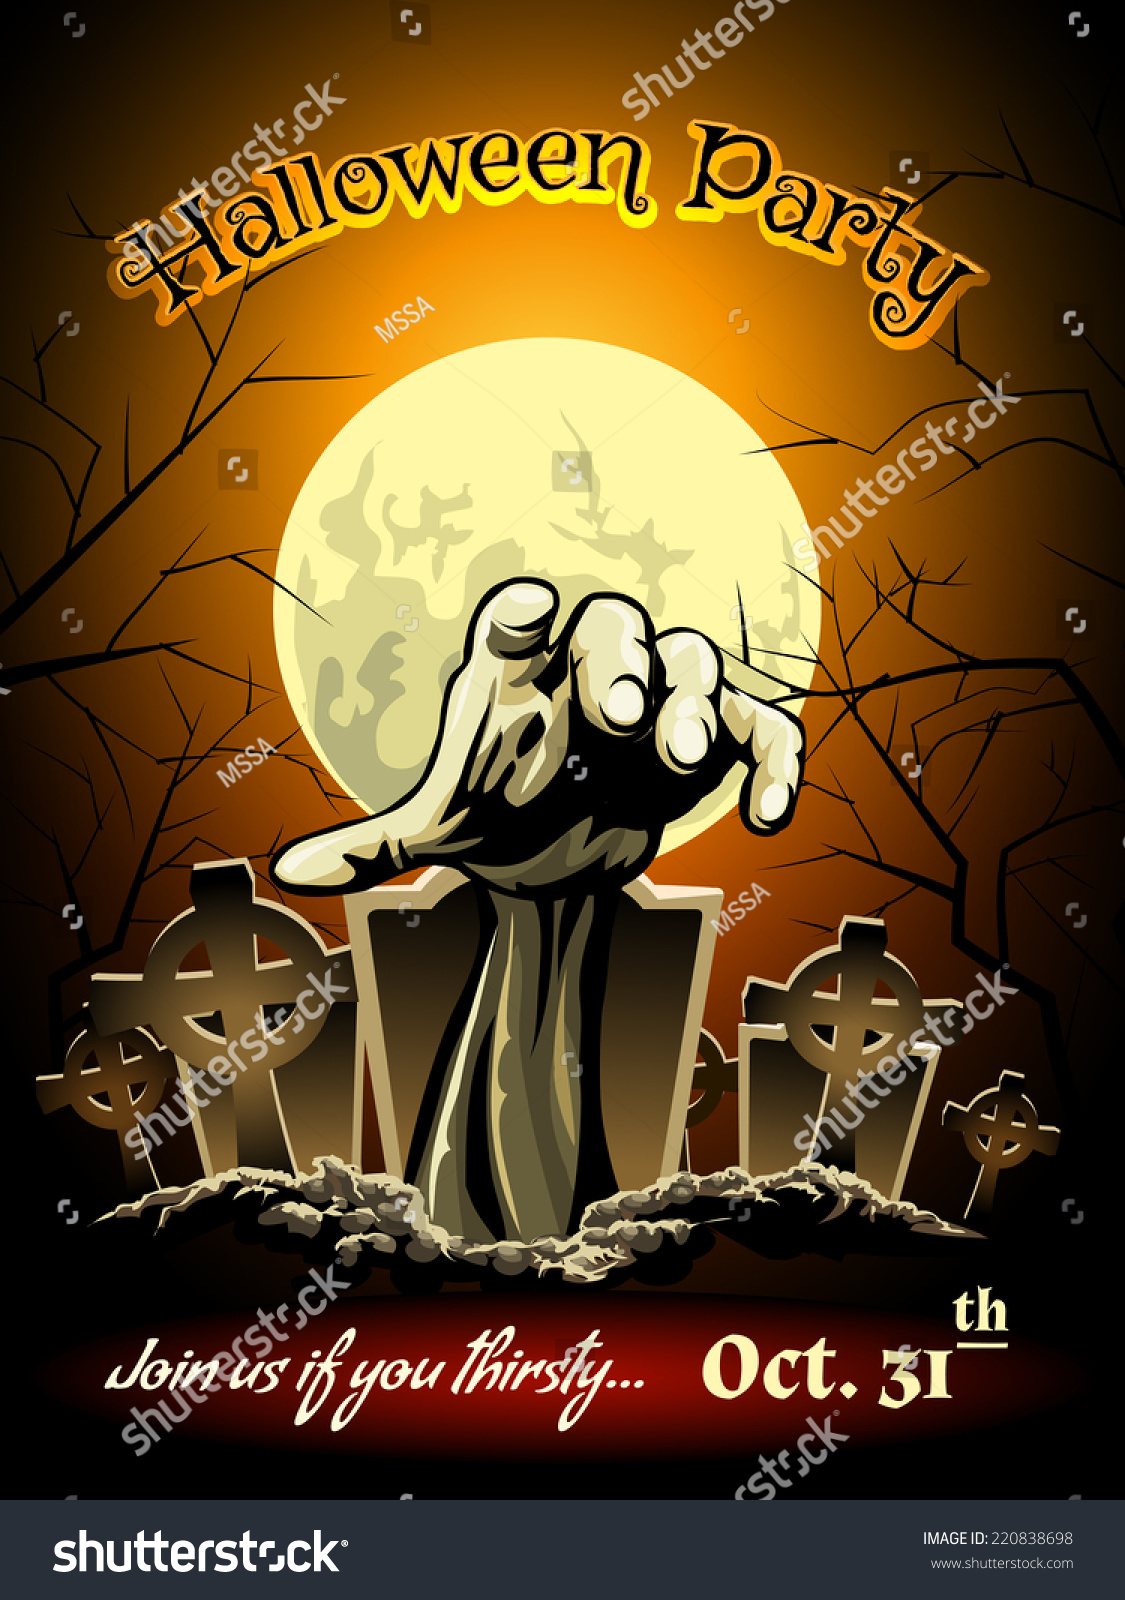 Halloween Party Invitation Zombie Cemetery Graphic Stock Vector ...